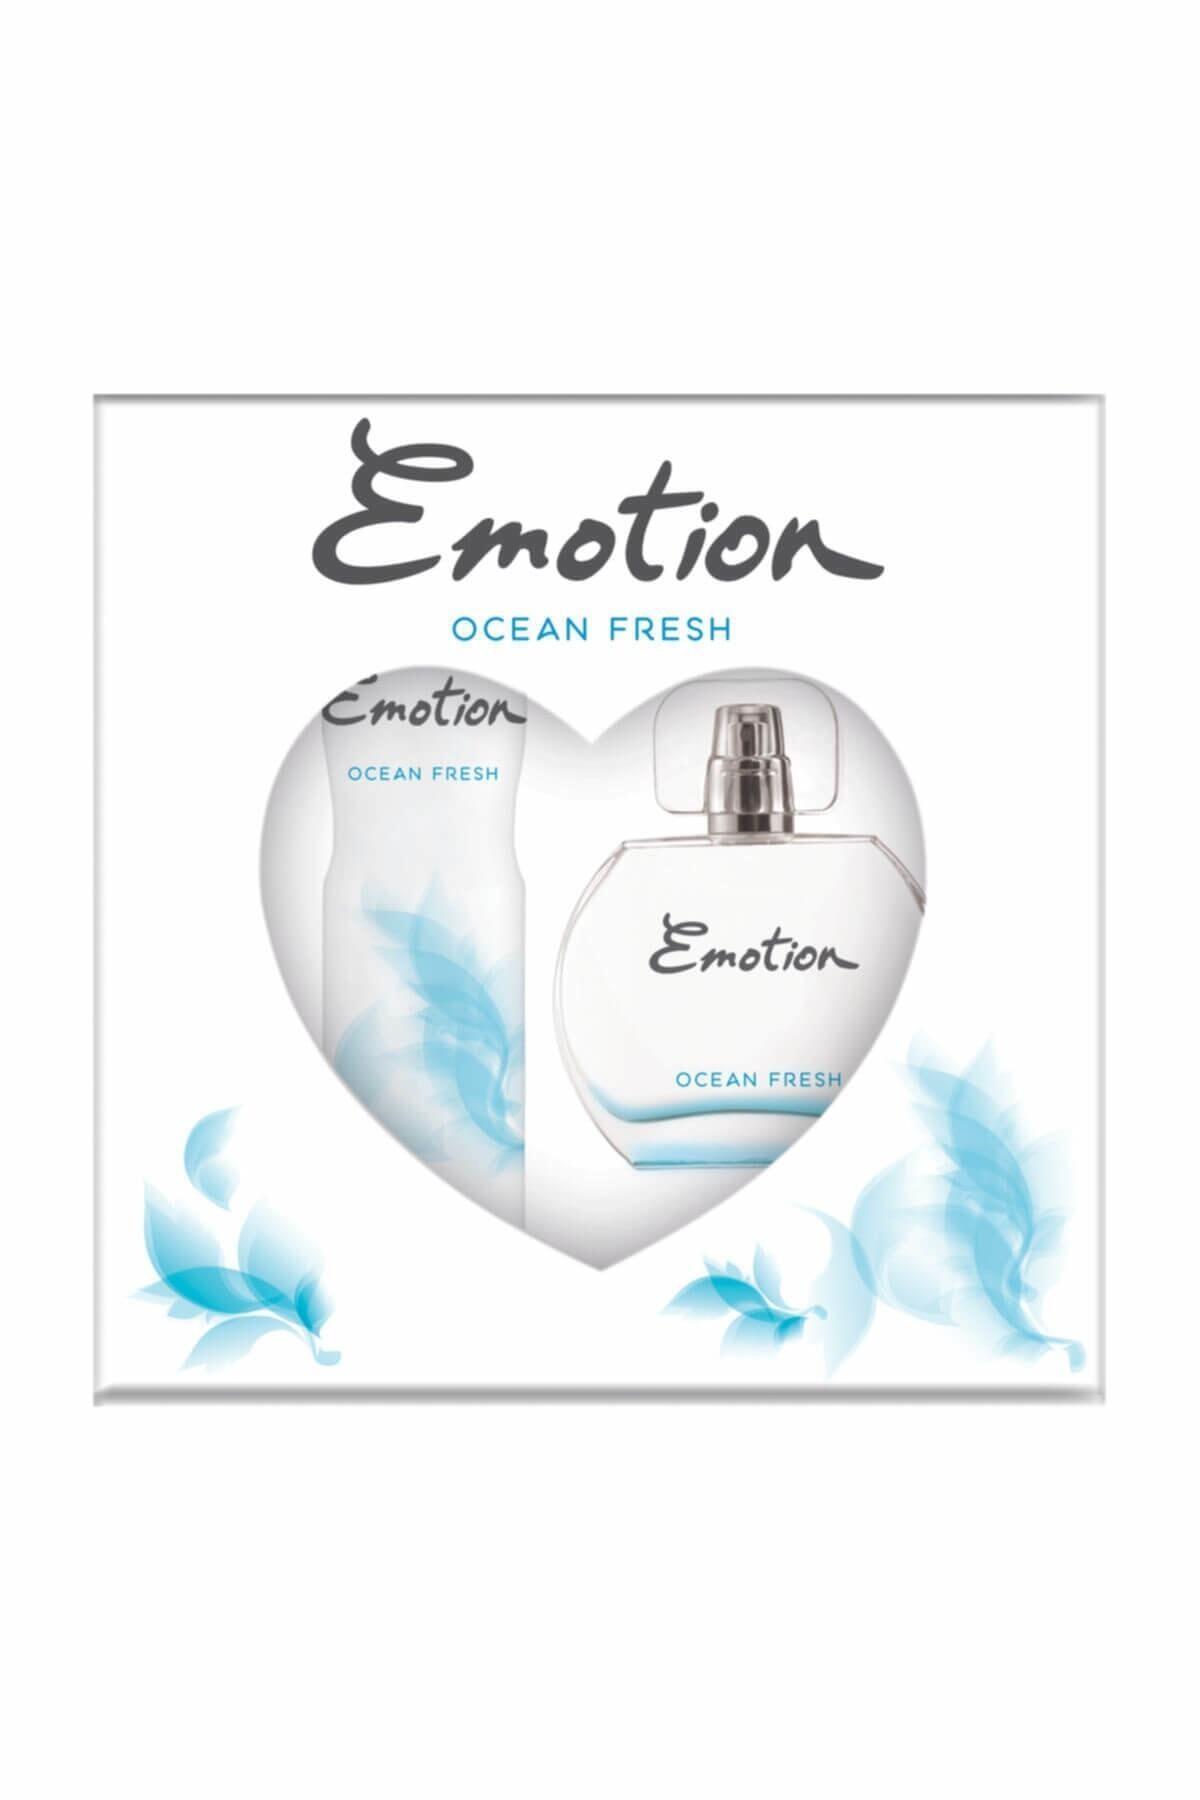 Emotion Ocean Fresh Edt 50 Ml + 150 Ml Deodorant Kadın Parfüm Seti 8690586016667 1